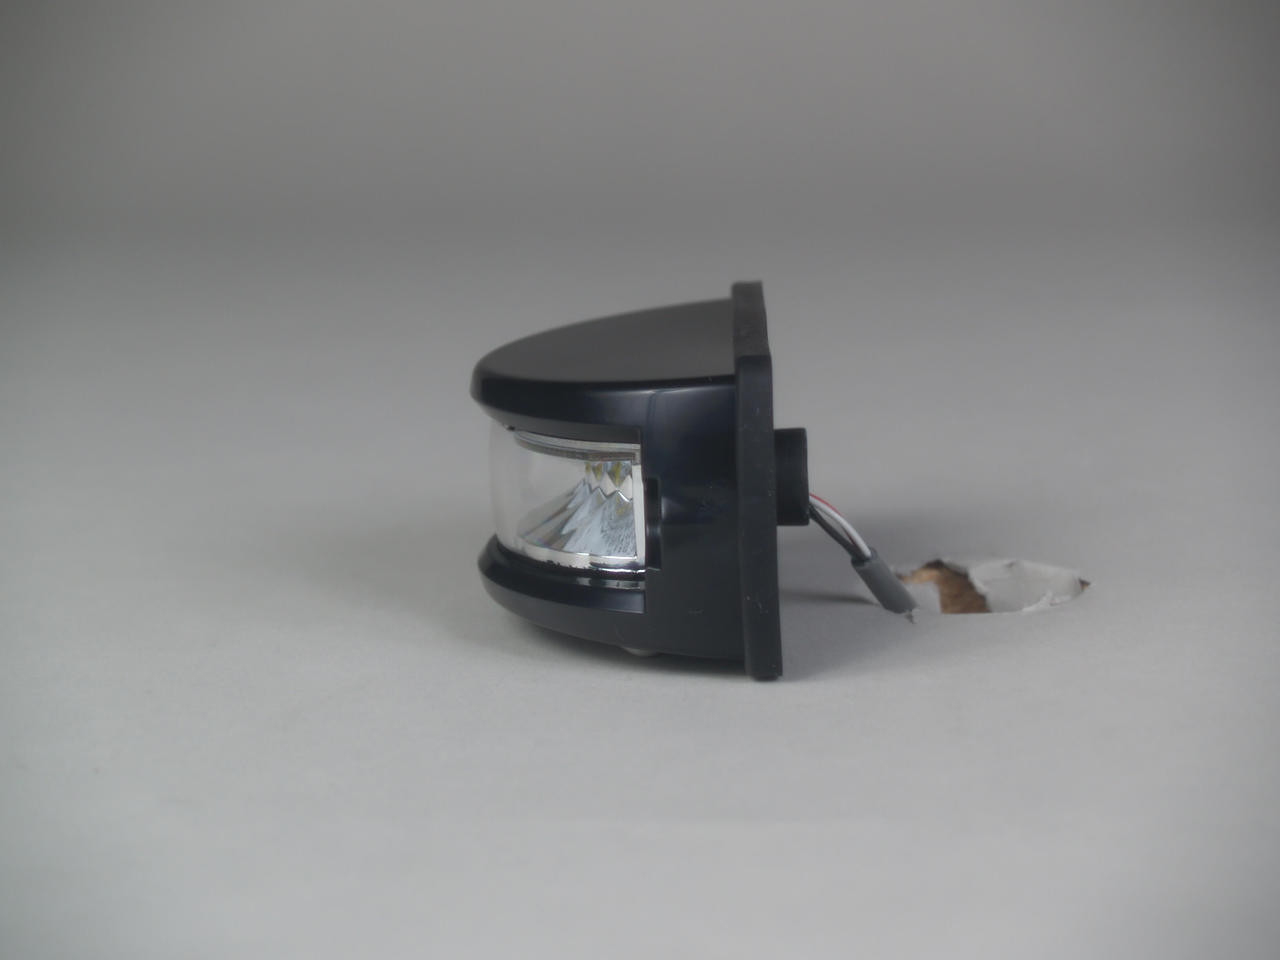 Soundoff ENT3B3 Intersector Surface Mount Single Color LED Light Head, 180 degree wide angle, 8 LEDs, Black White or Chrome Housing